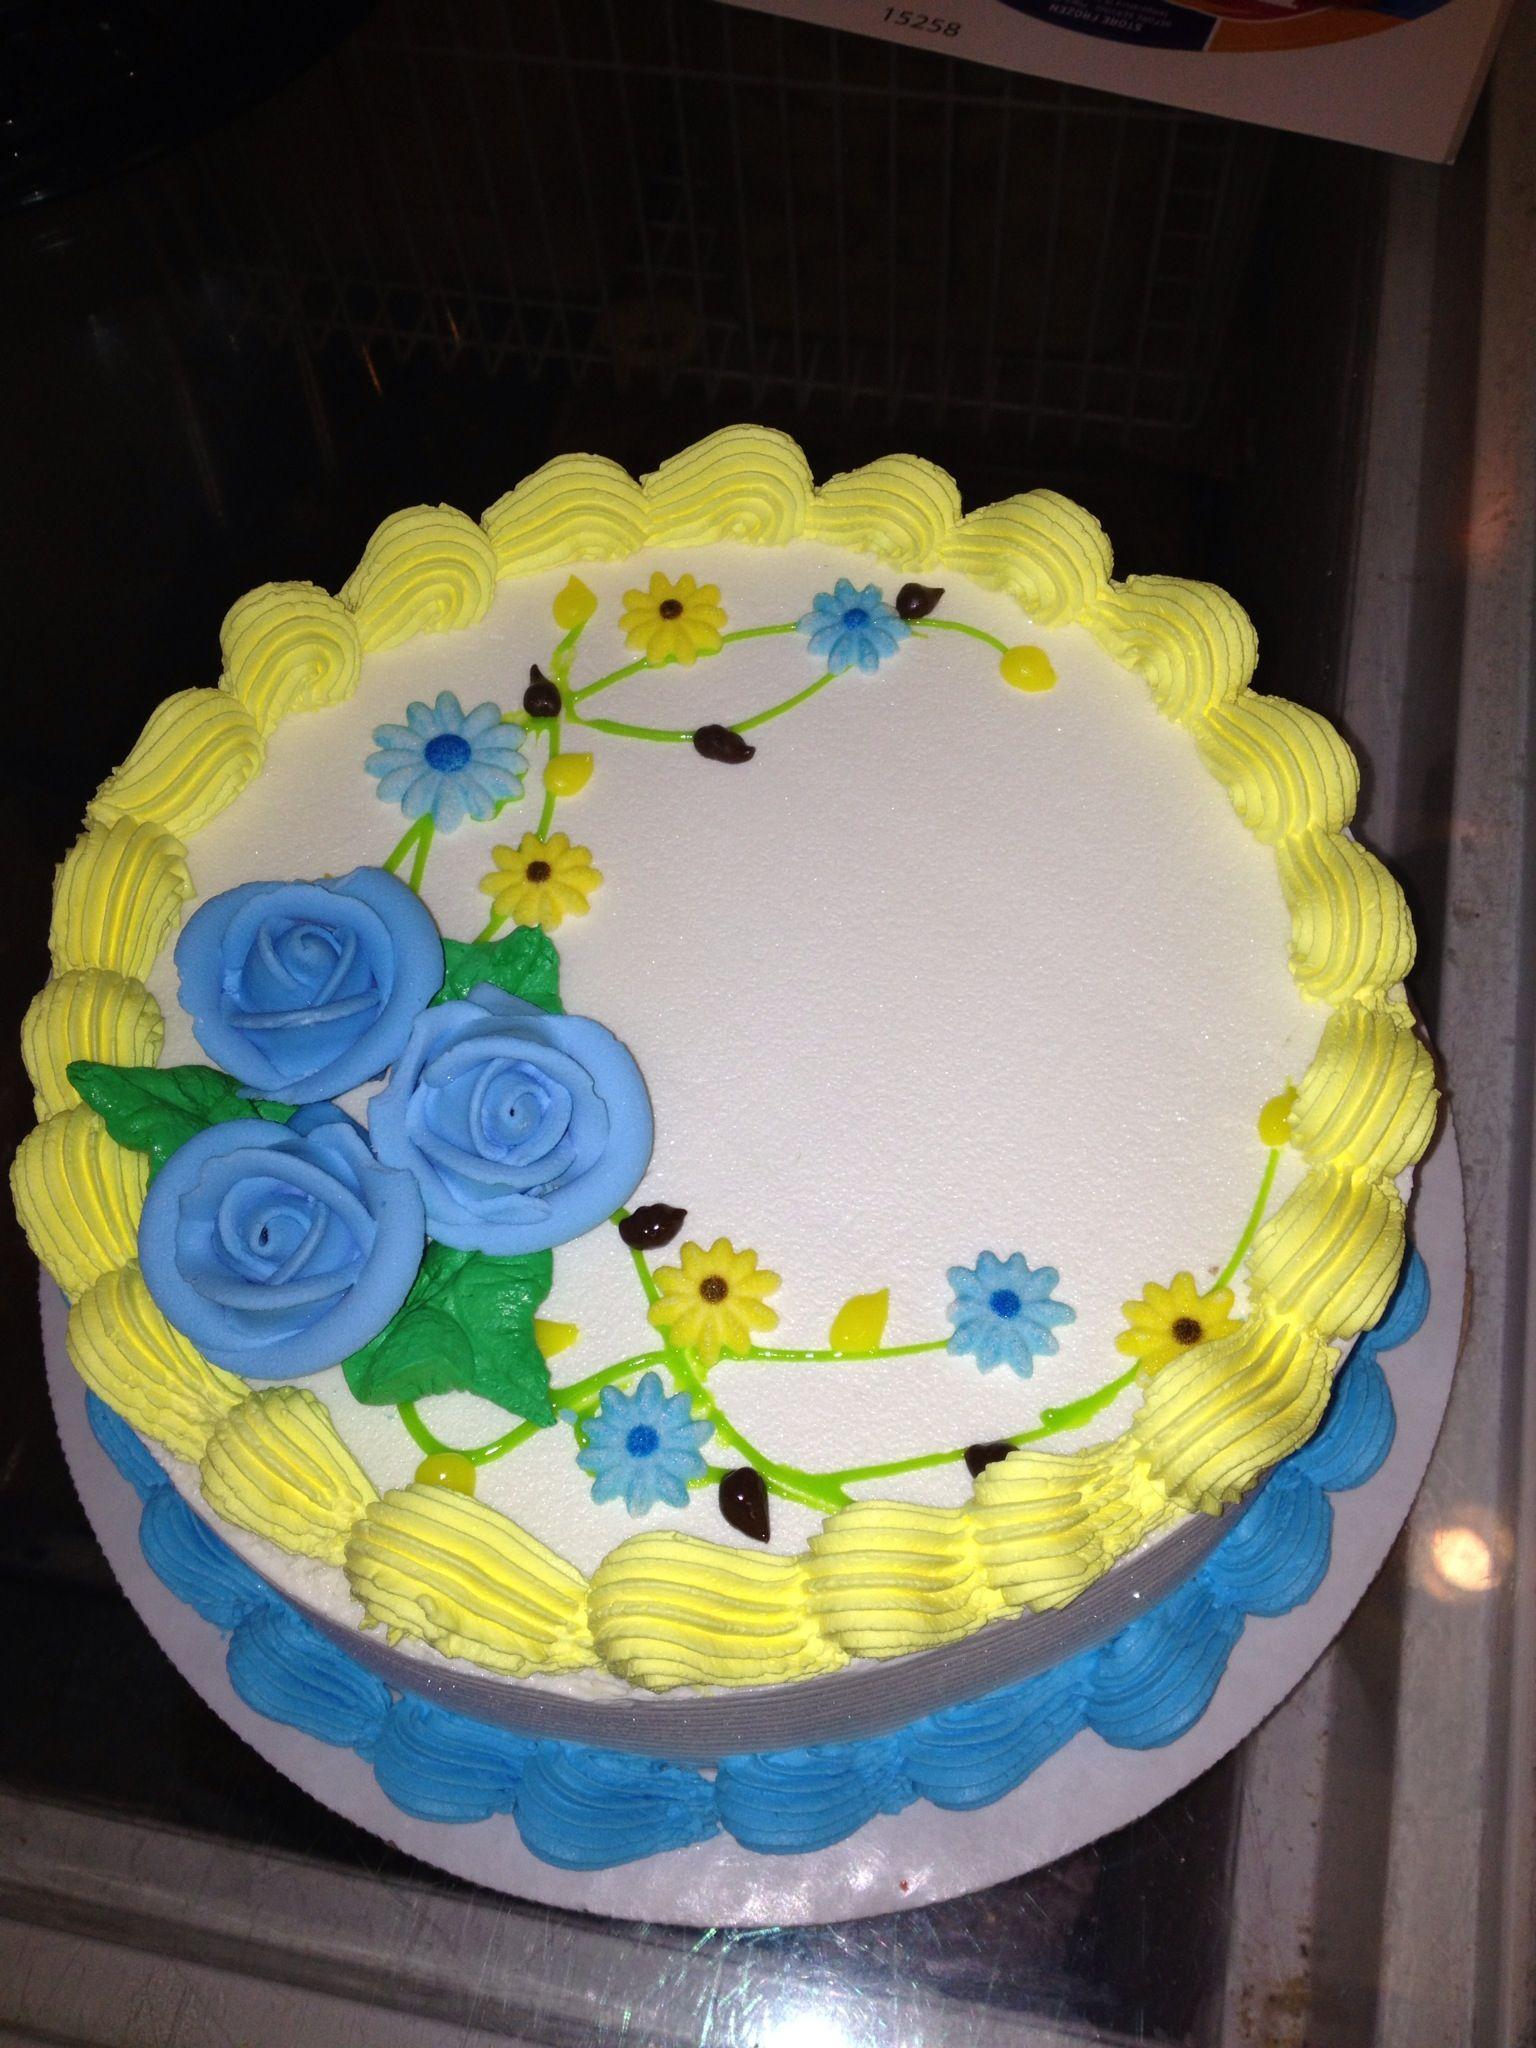 Roses flowersDq cakesDairy Queen Cakes Pinterest Dairy